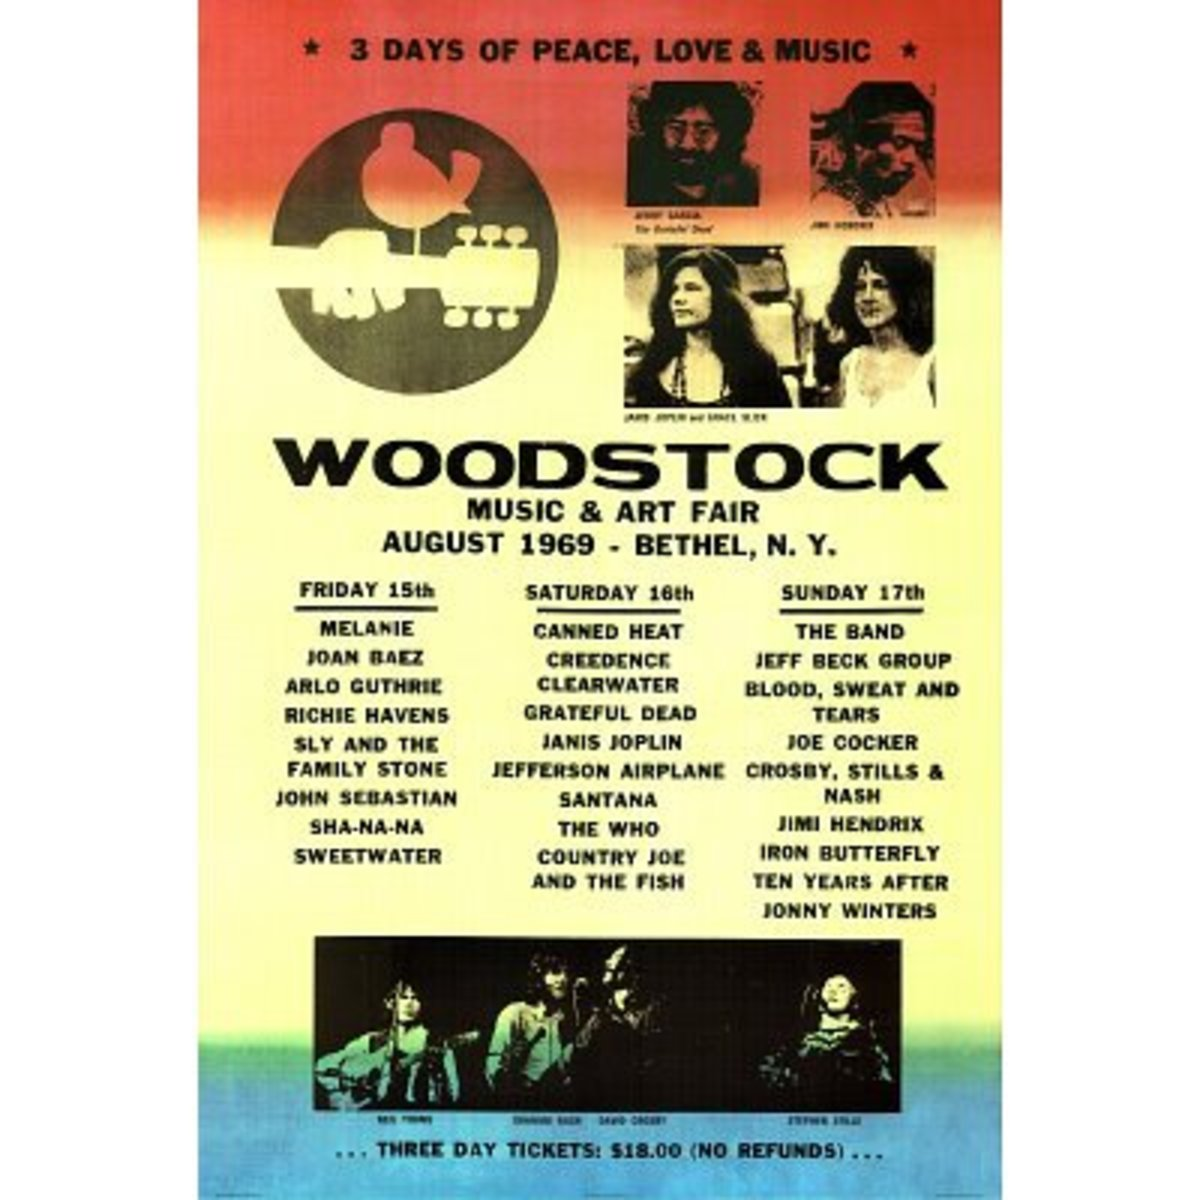 1969 Woodstock poster